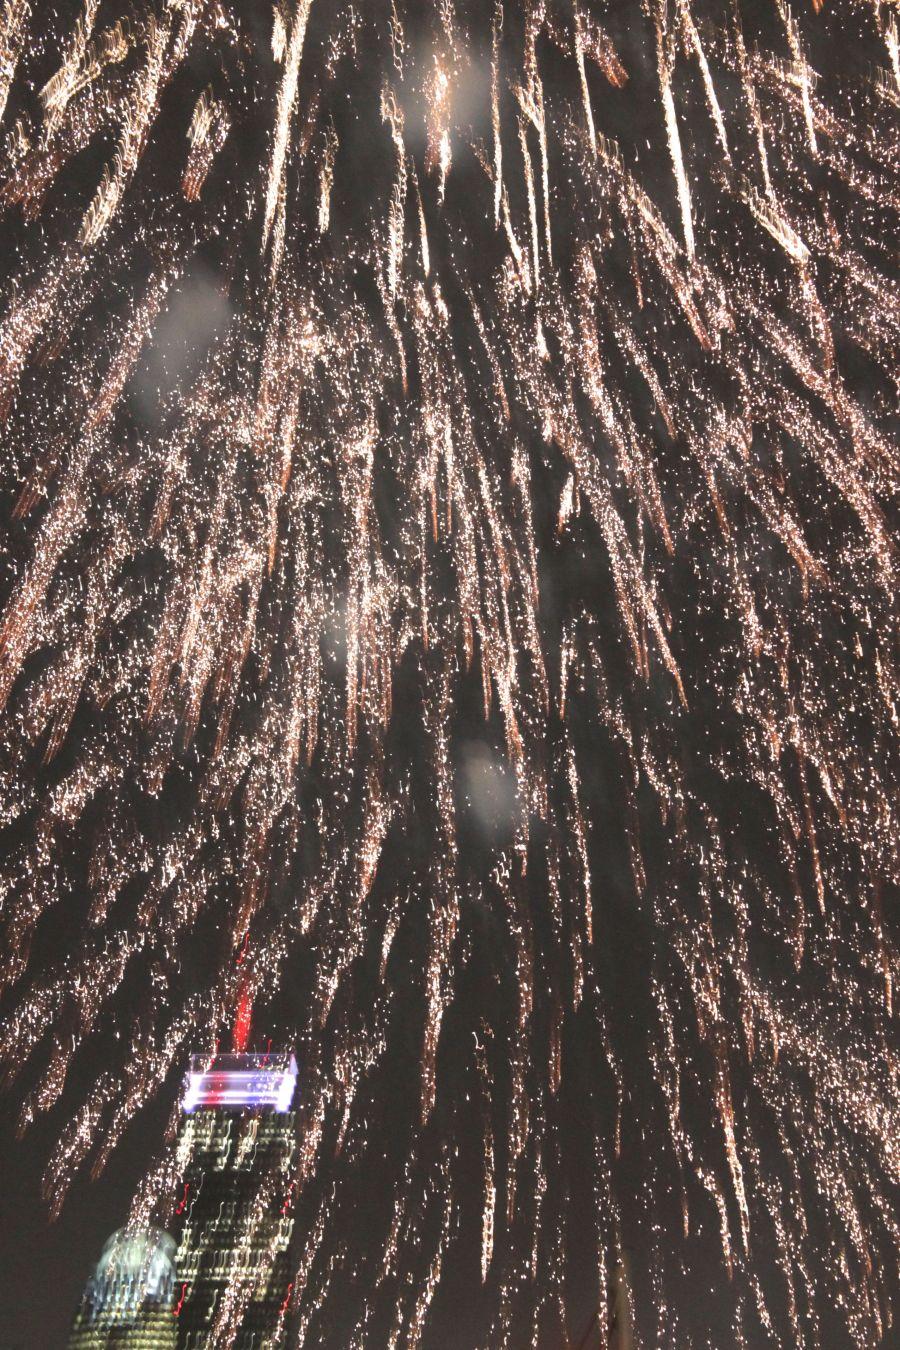 boston july 3 2014 fireworks charles river 18